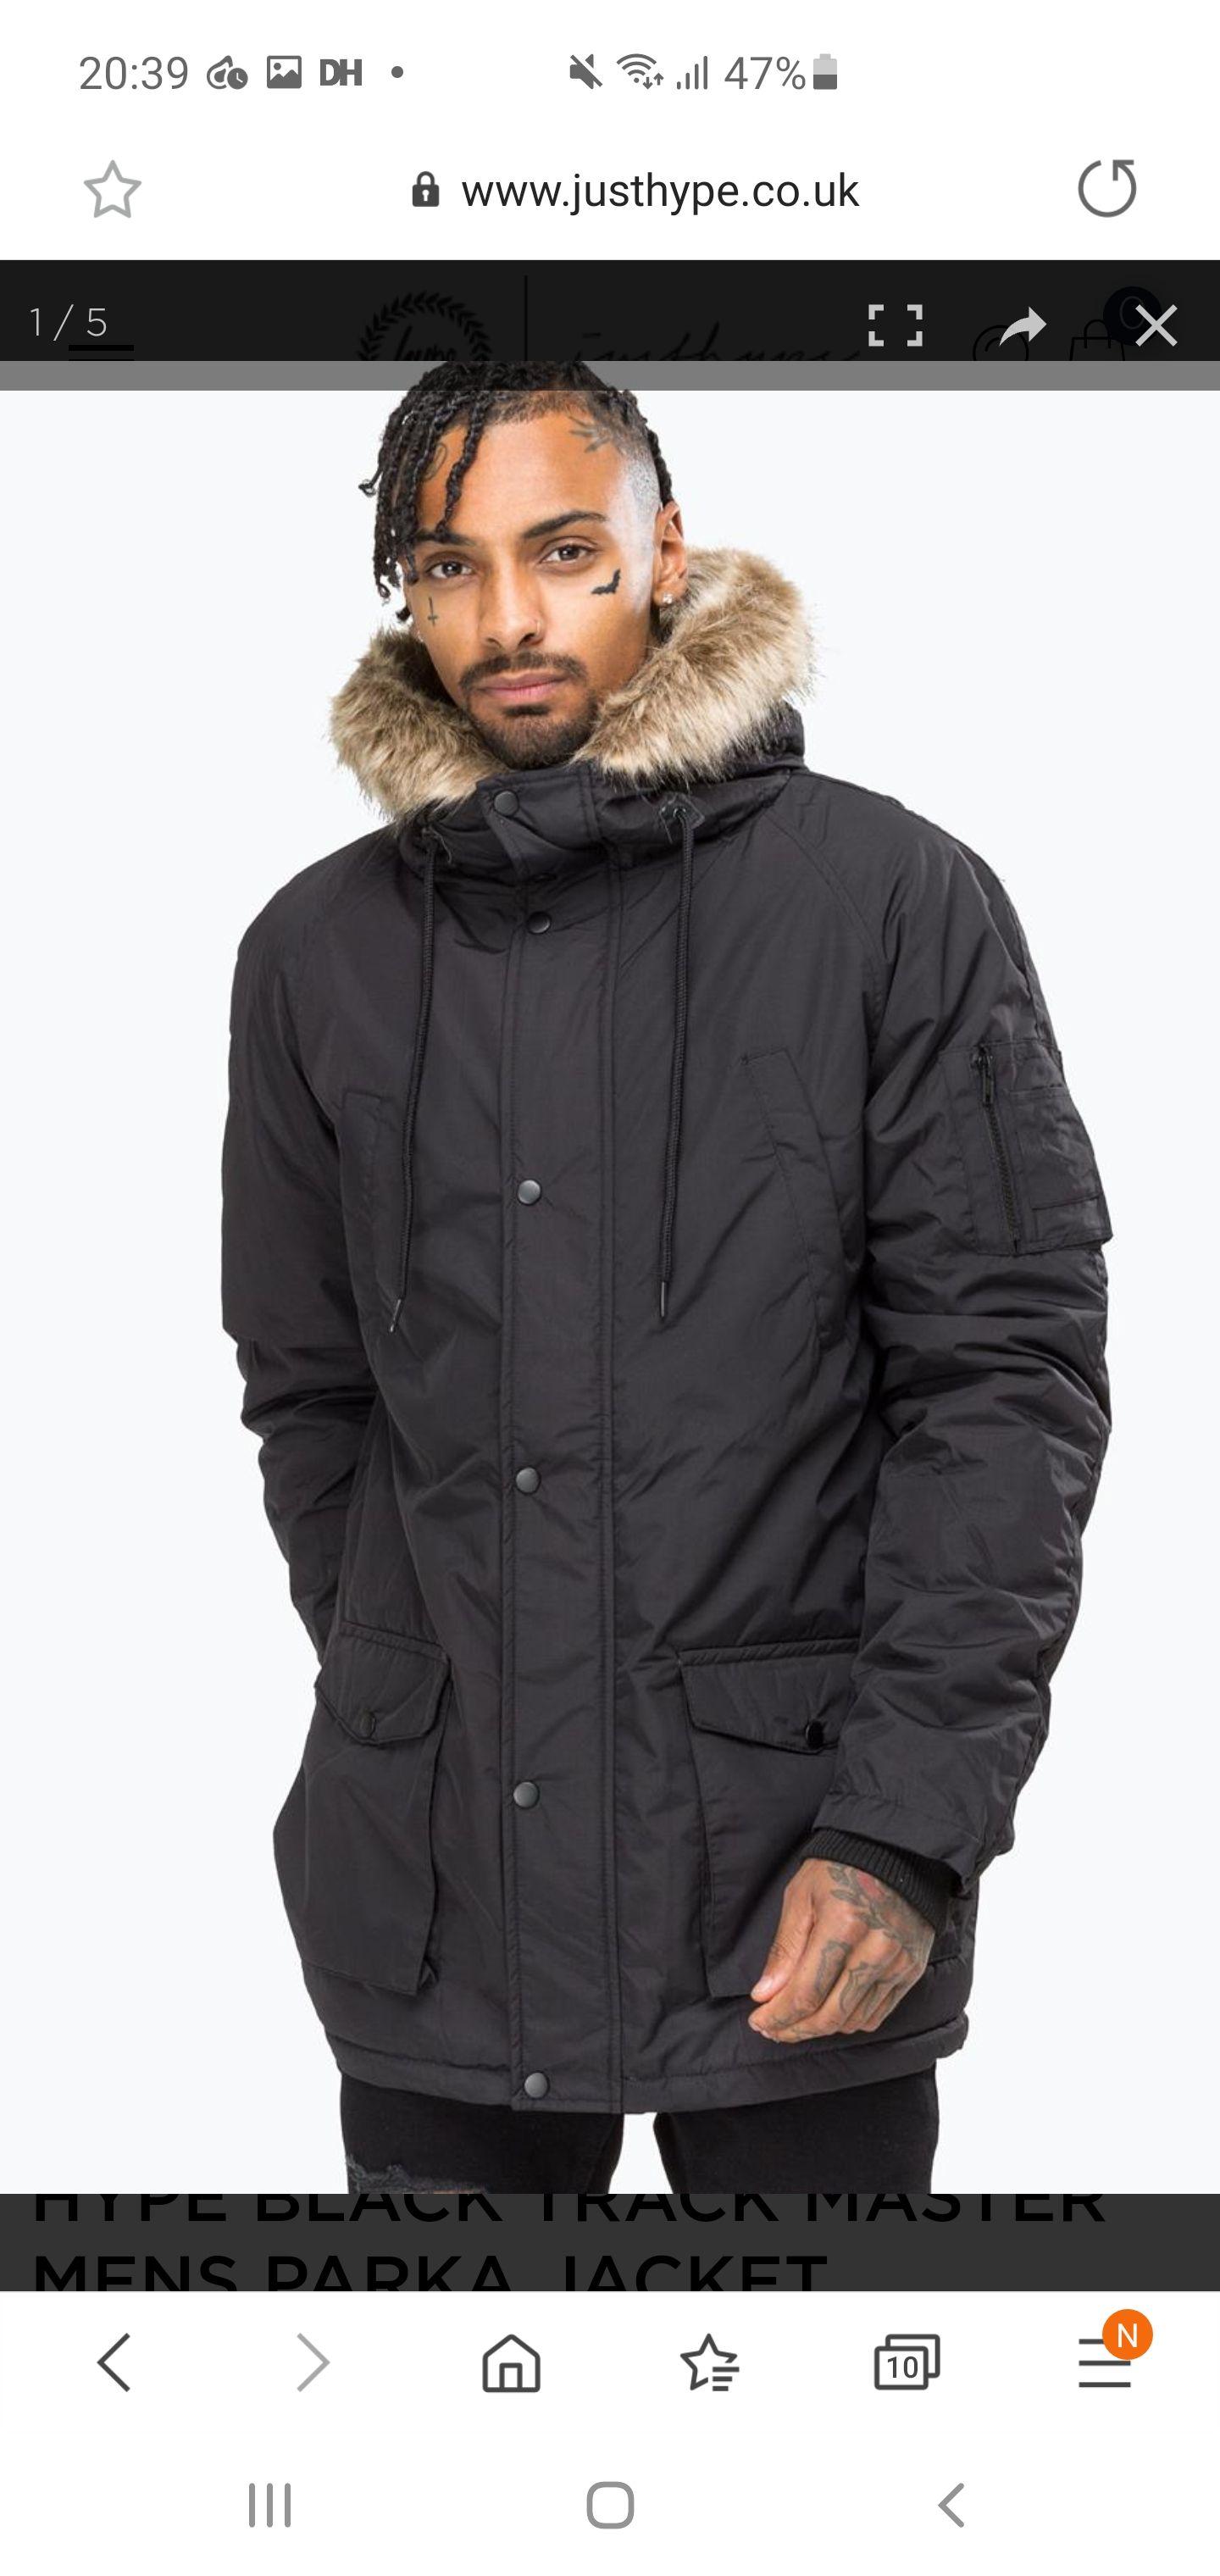 Hype Black Track Master Mens Parka Jacket £6.80 @ Just Hype (£2.49 P&P)